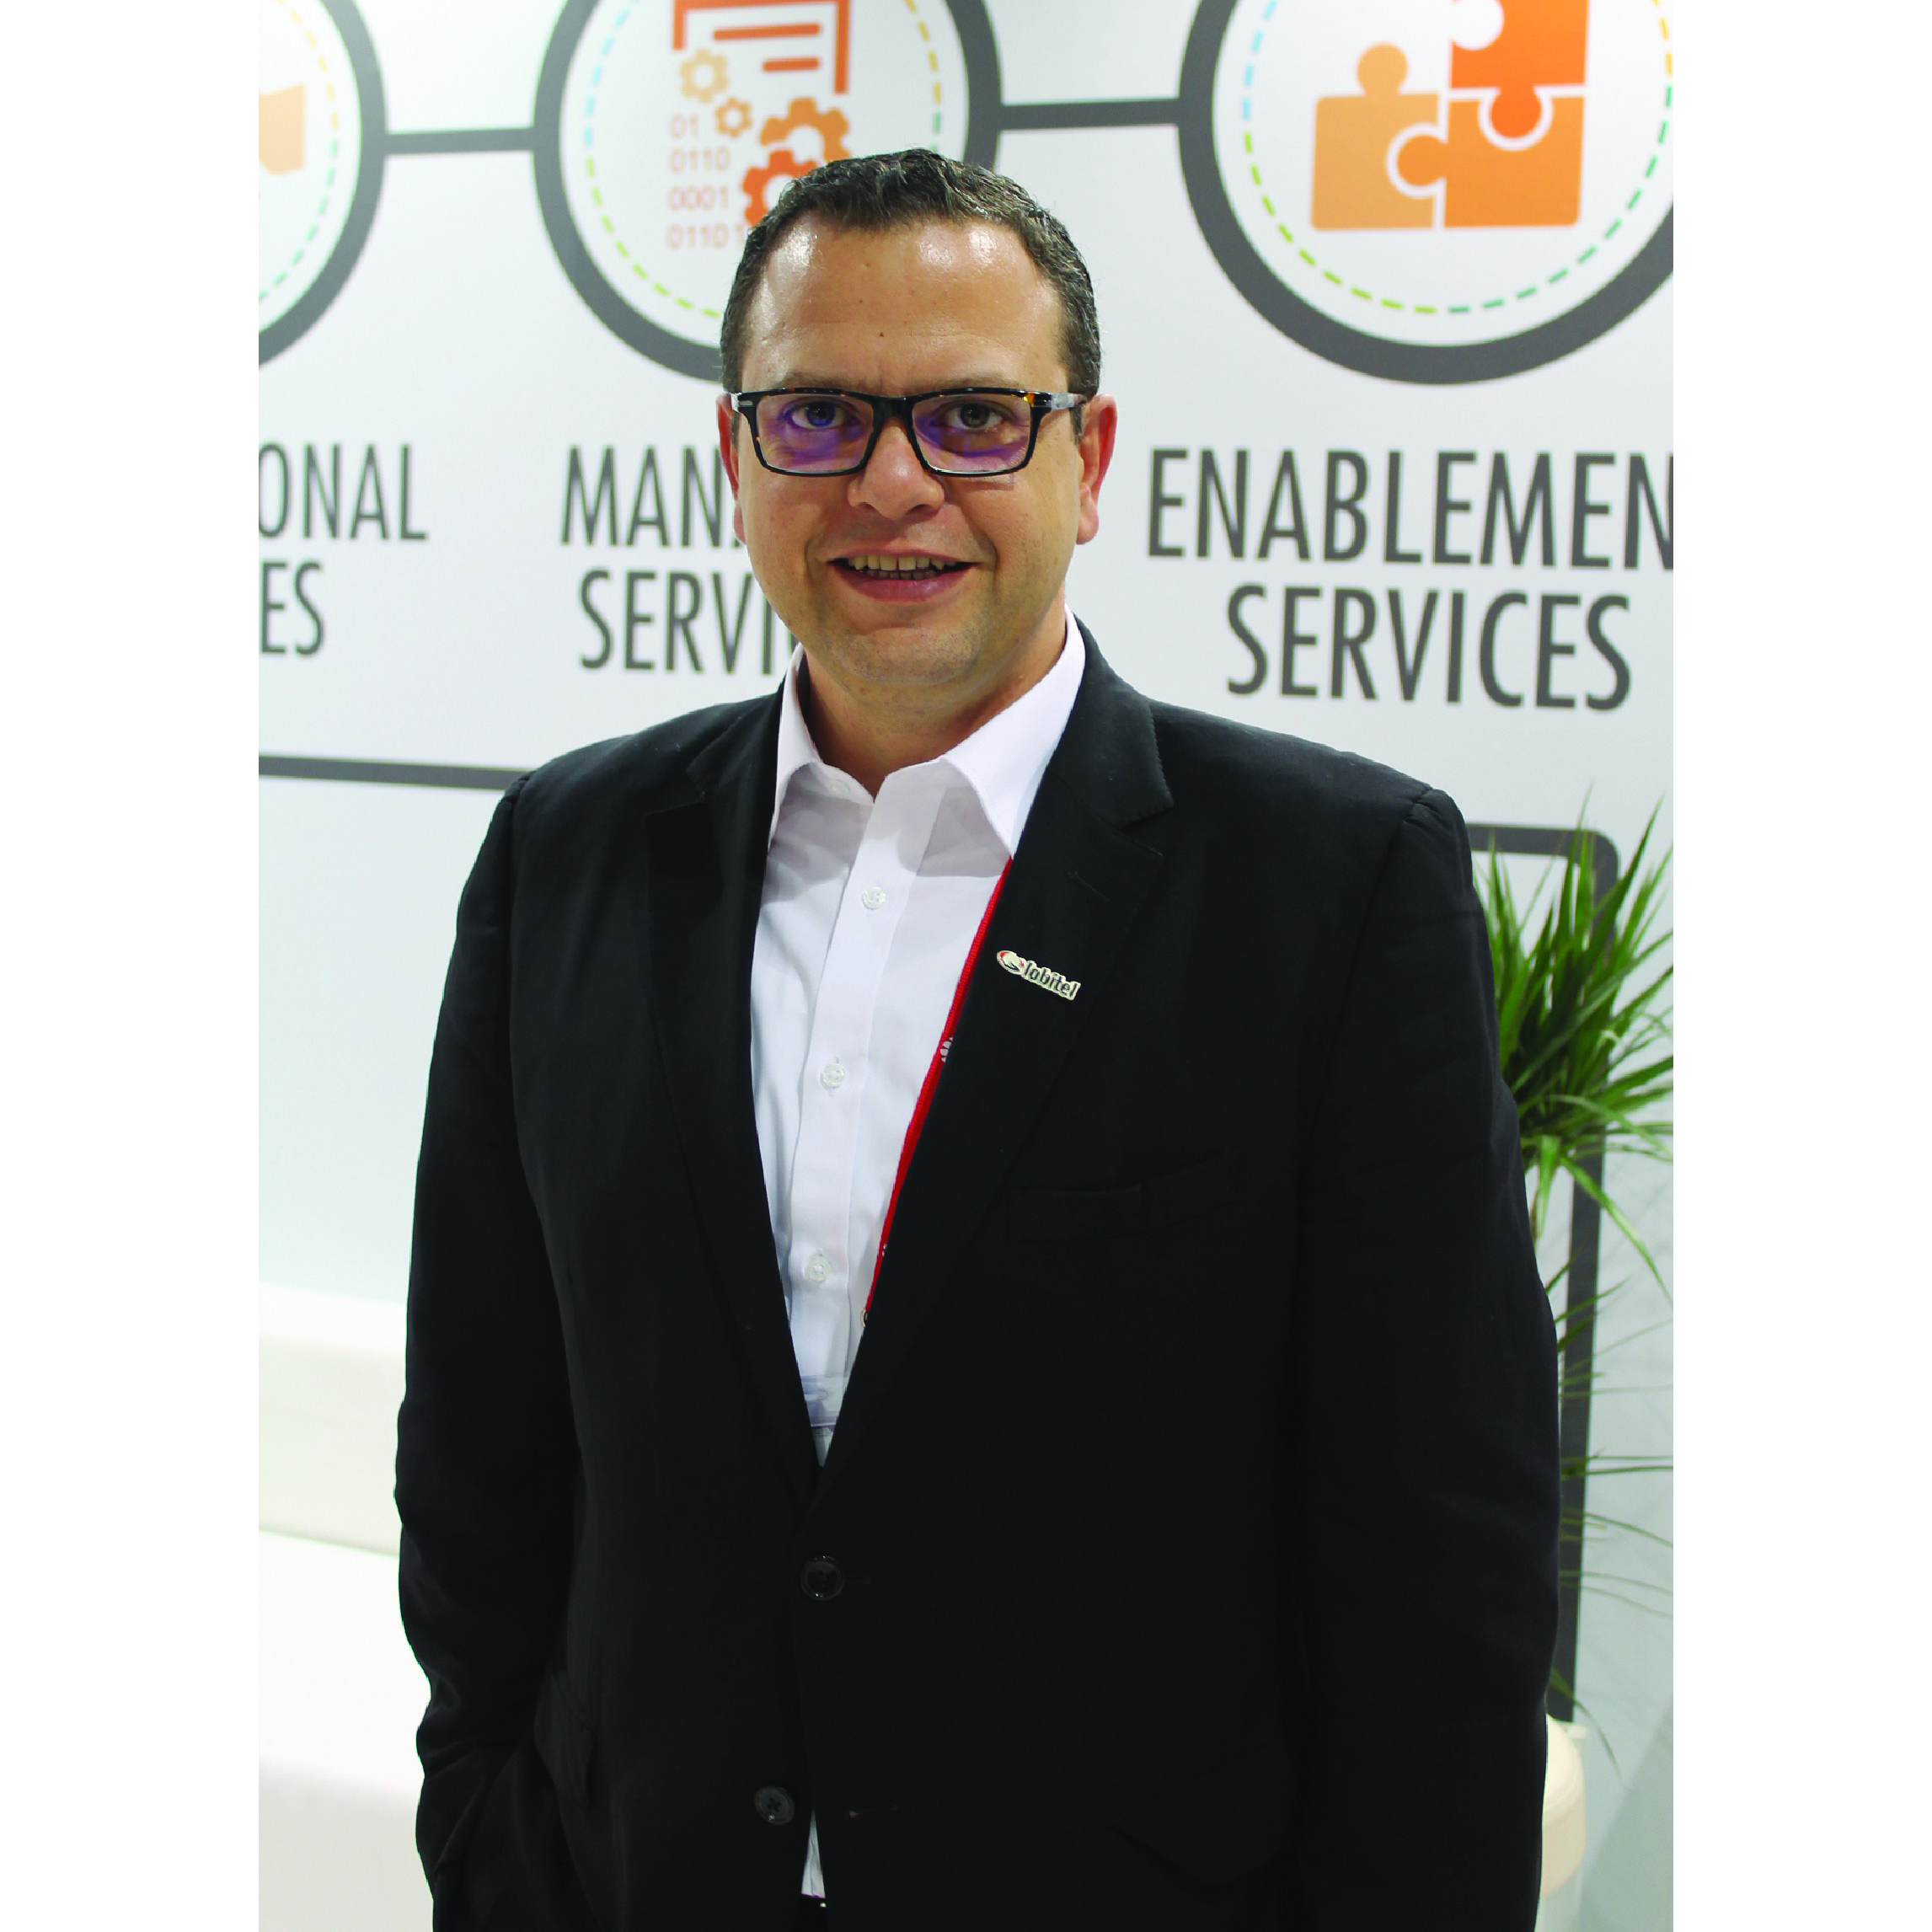 Globitel Saudi Arabia appoints Nael Halawa as Managing Director